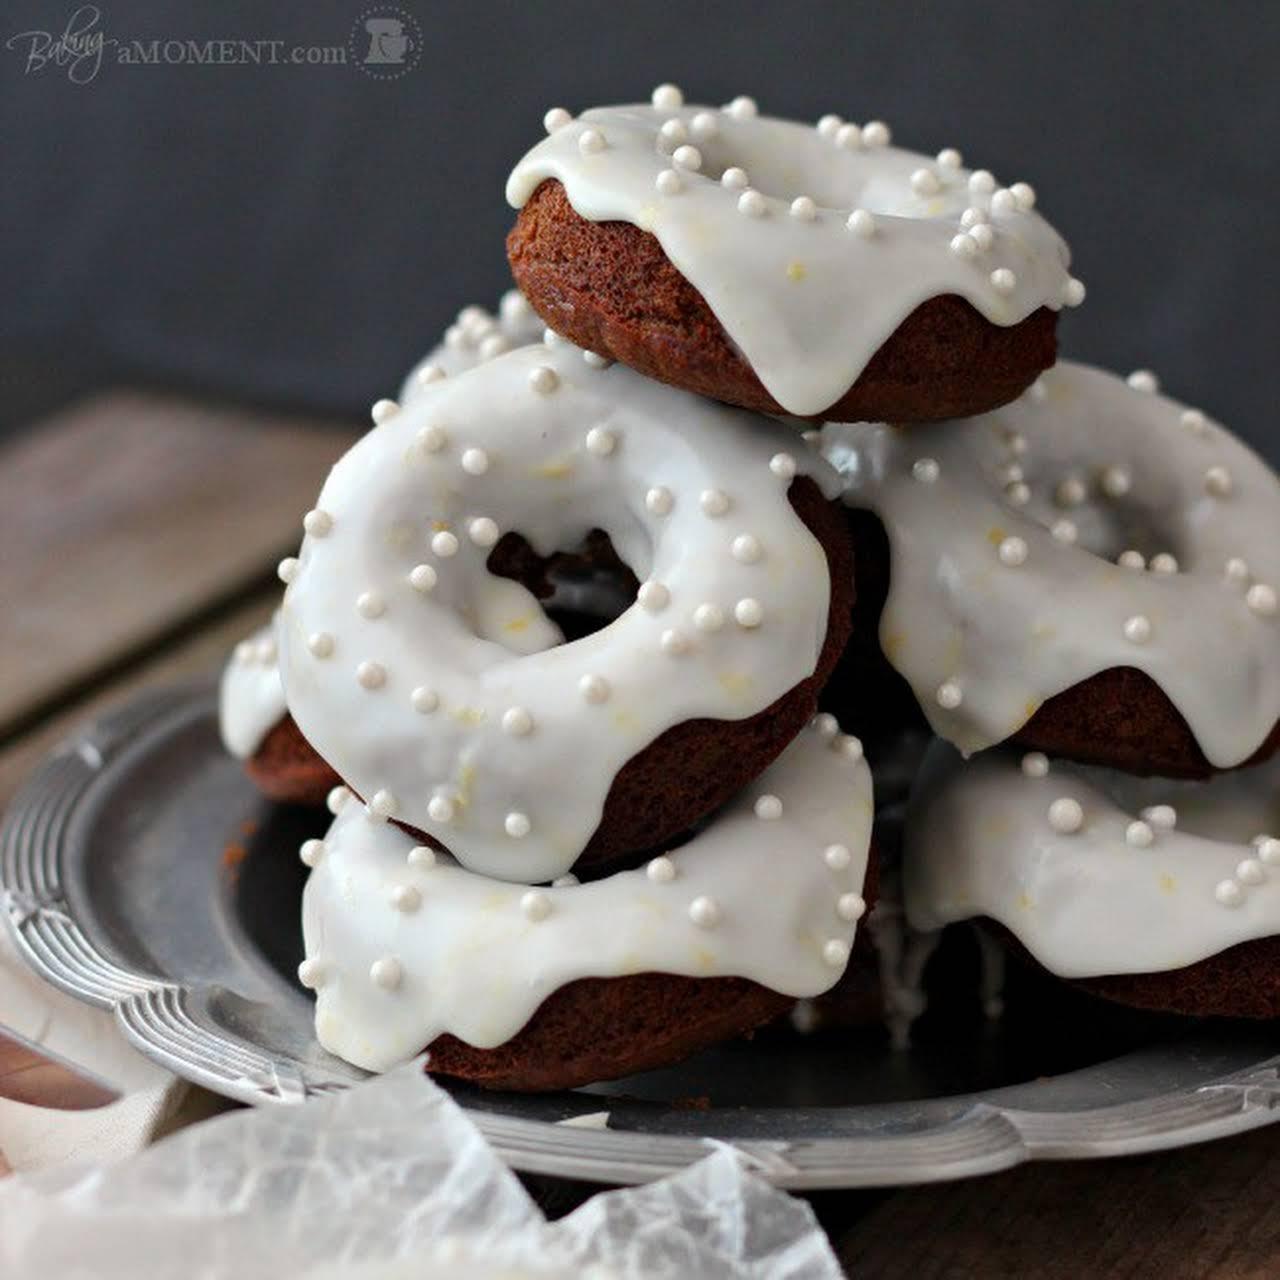 Baked Gingerbread Donuts with Lemon Yogurt Glaze